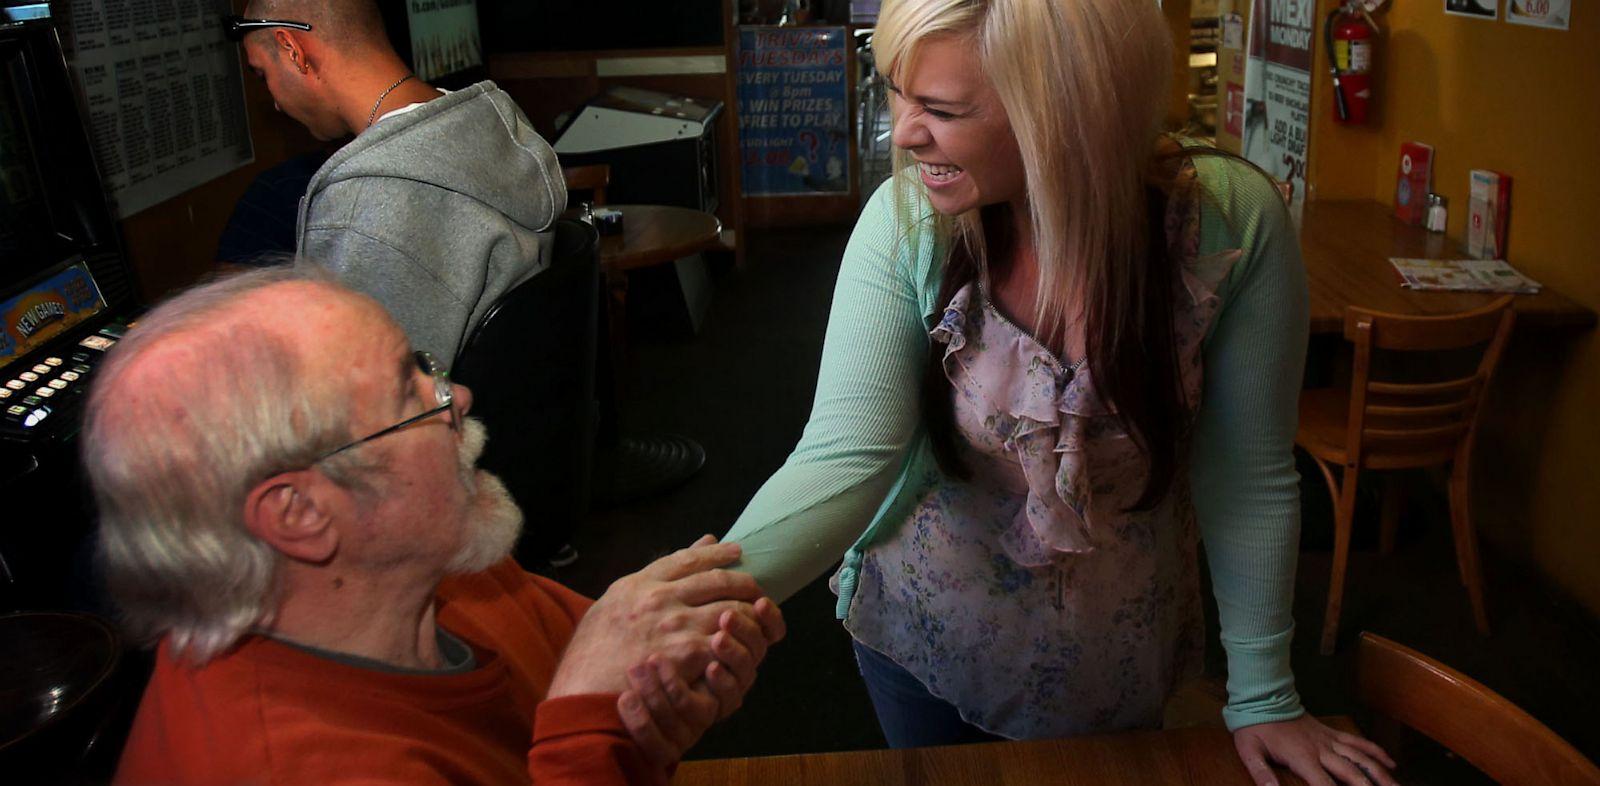 PHOTO: Bartender Aurora Kephart receives winning lottery ticket worth $17,500